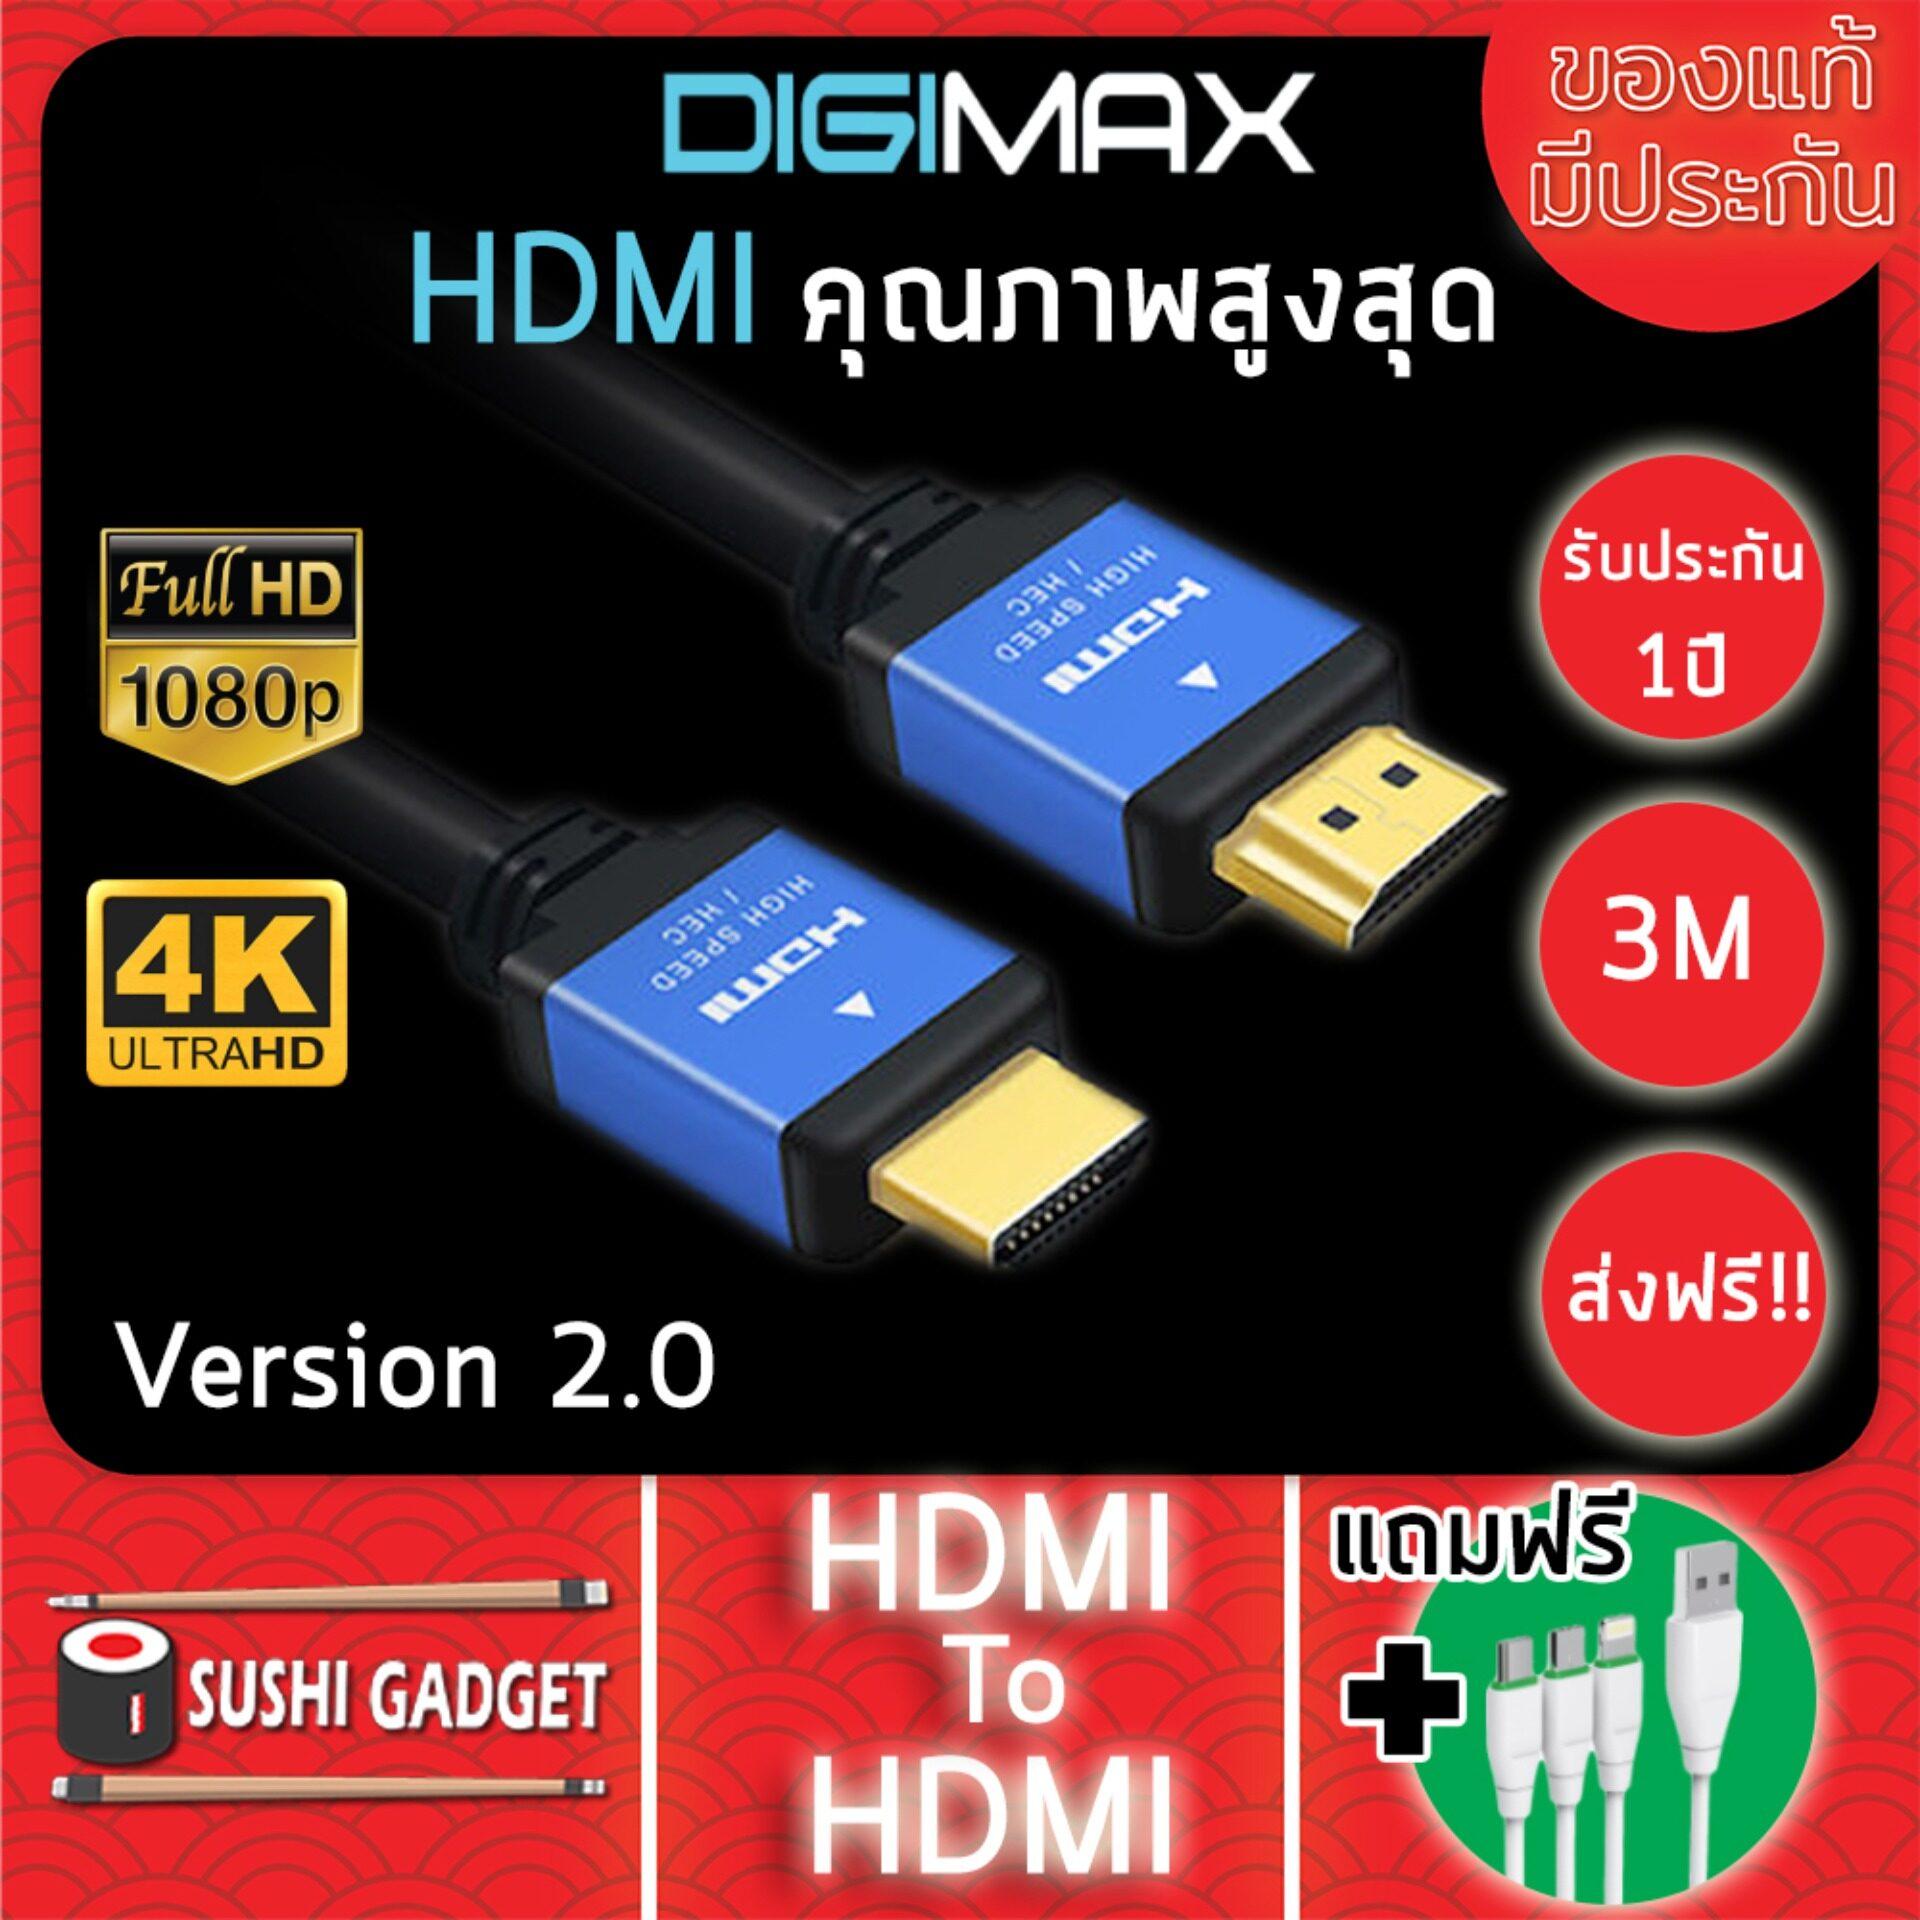 4k สาย Hdmi To Hdmi ขนาด 3 เมตร Full Hd รองรับ 4k, 3d, Tv, Monitor, Projector, Pc, Ps3, Ps4, Xbox, Dvd, เครื่องเล่น Vdo เส้น ใหญ่แข็งแรงทนทาน (สีดำ) โดย Sushi Gadget.